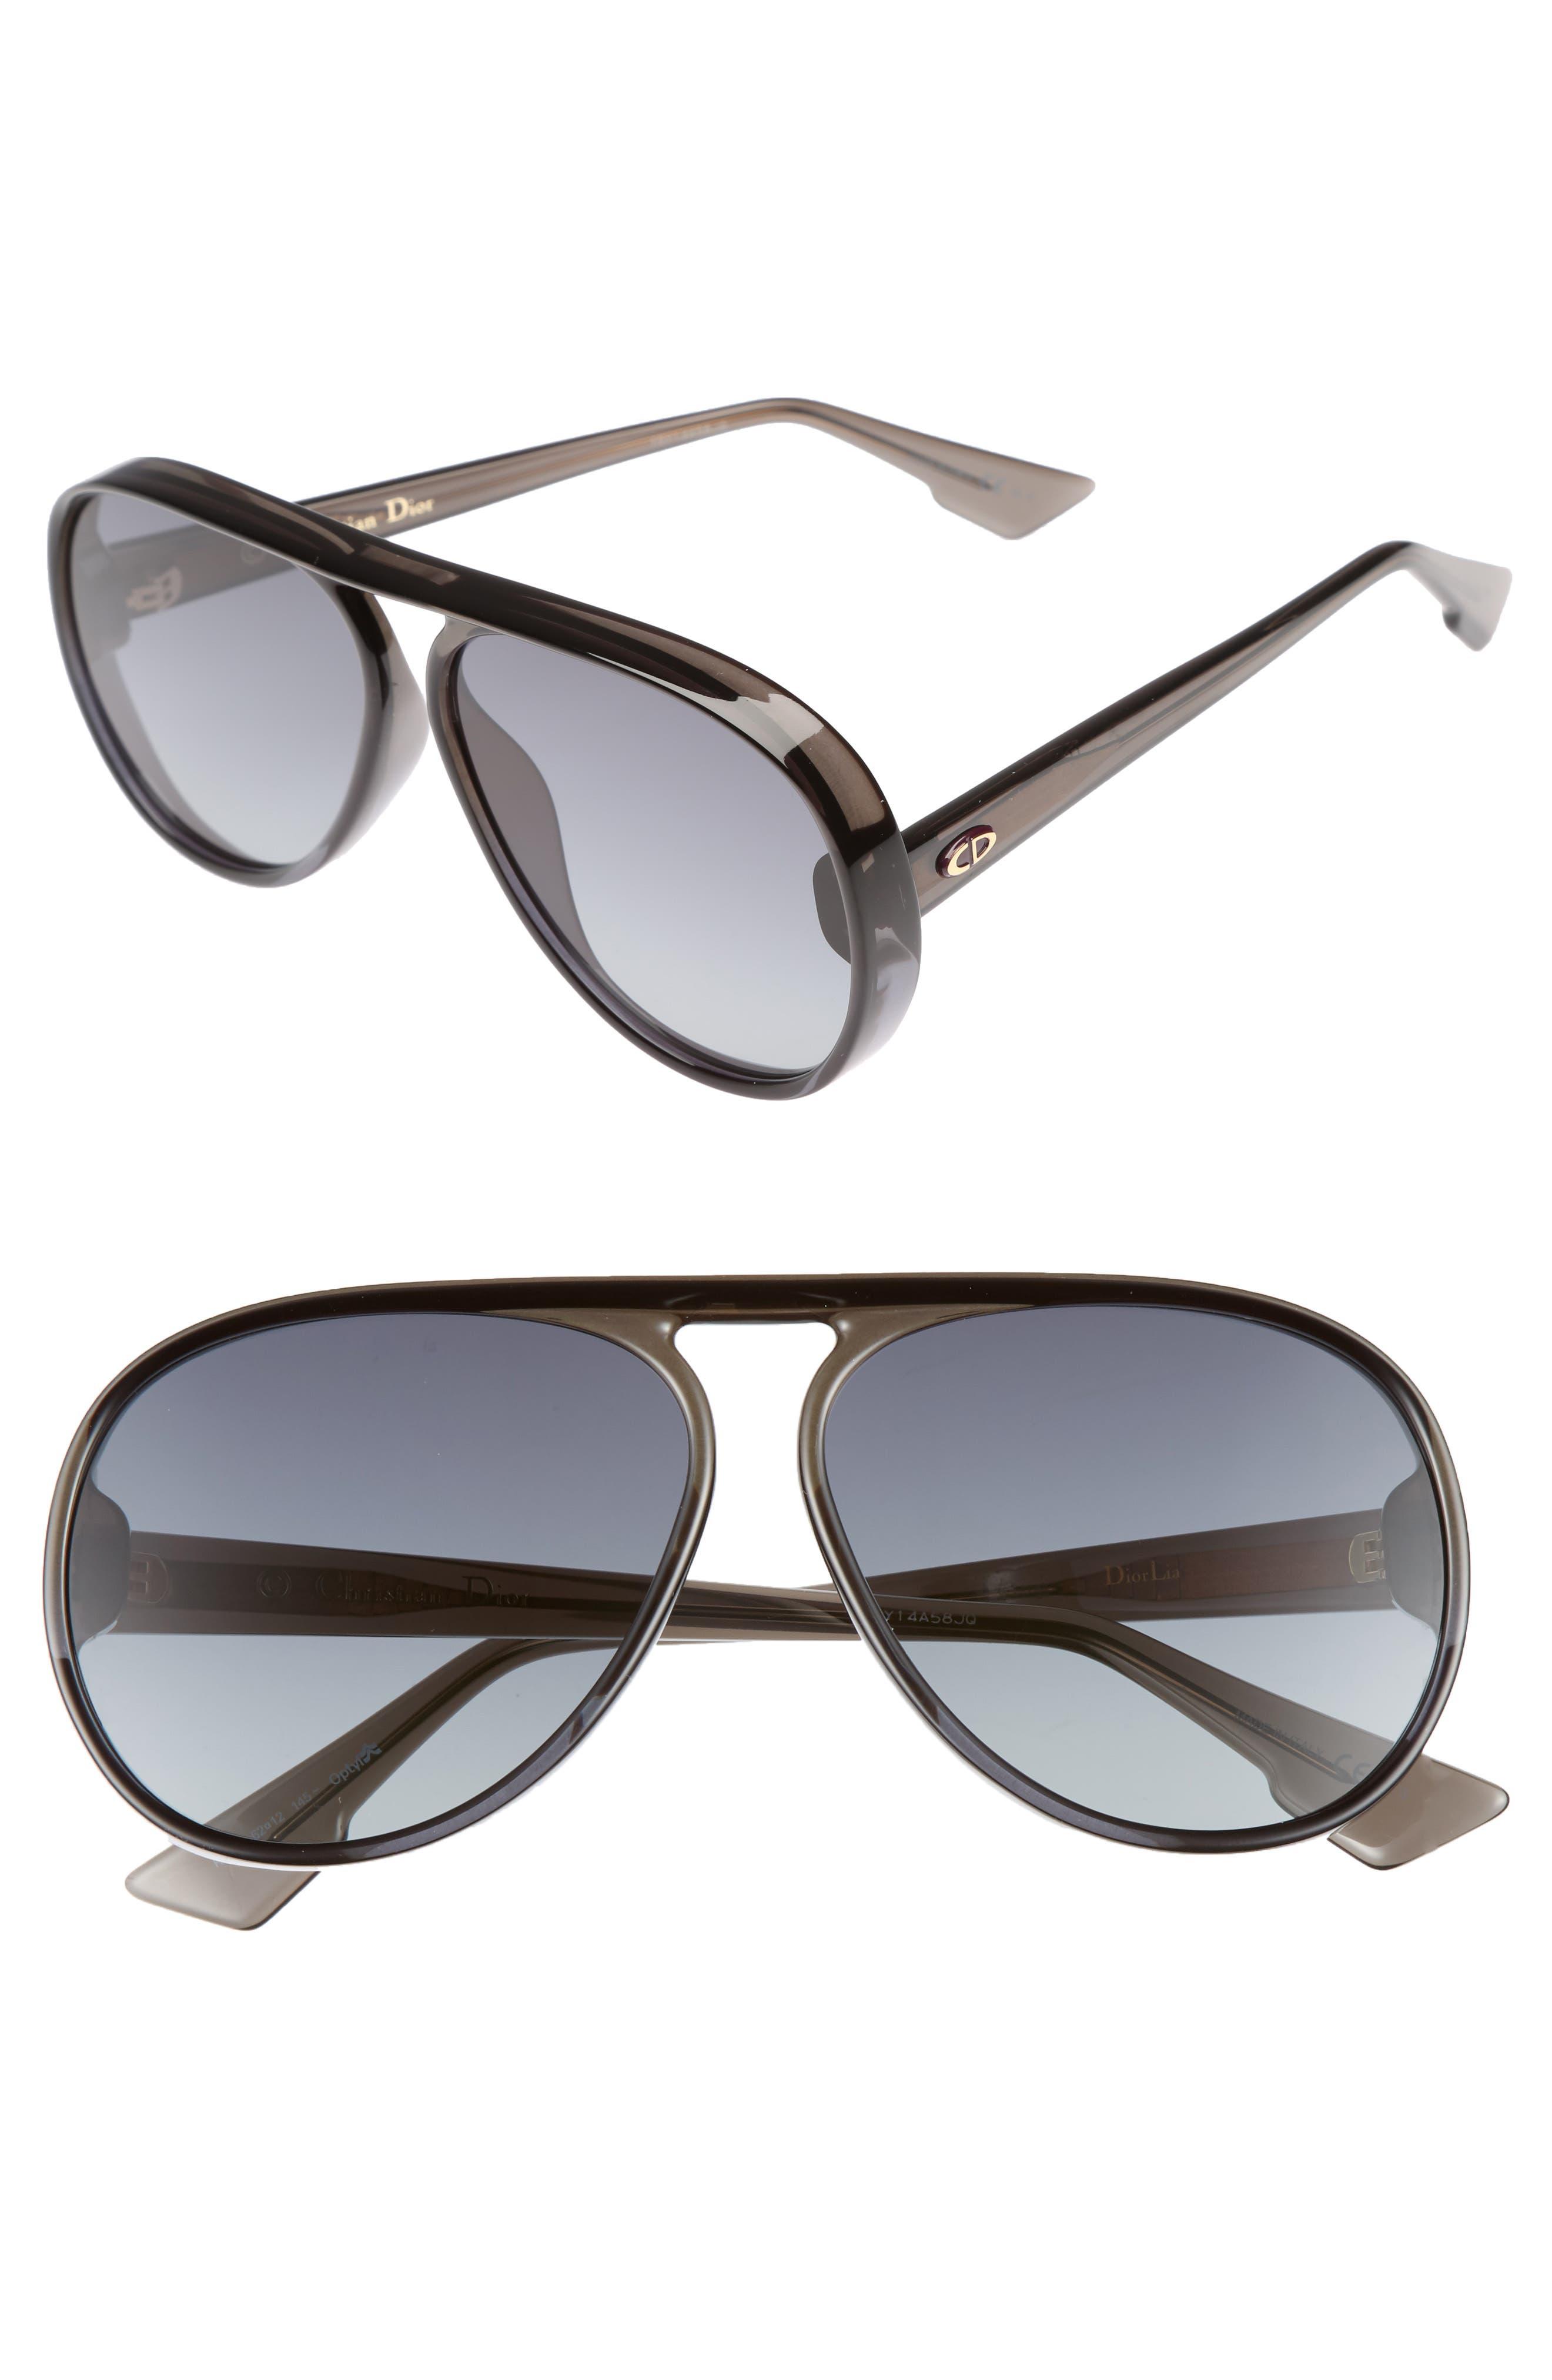 Lia 62mm Oversize Aviator Sunglasses,                             Main thumbnail 1, color,                             020